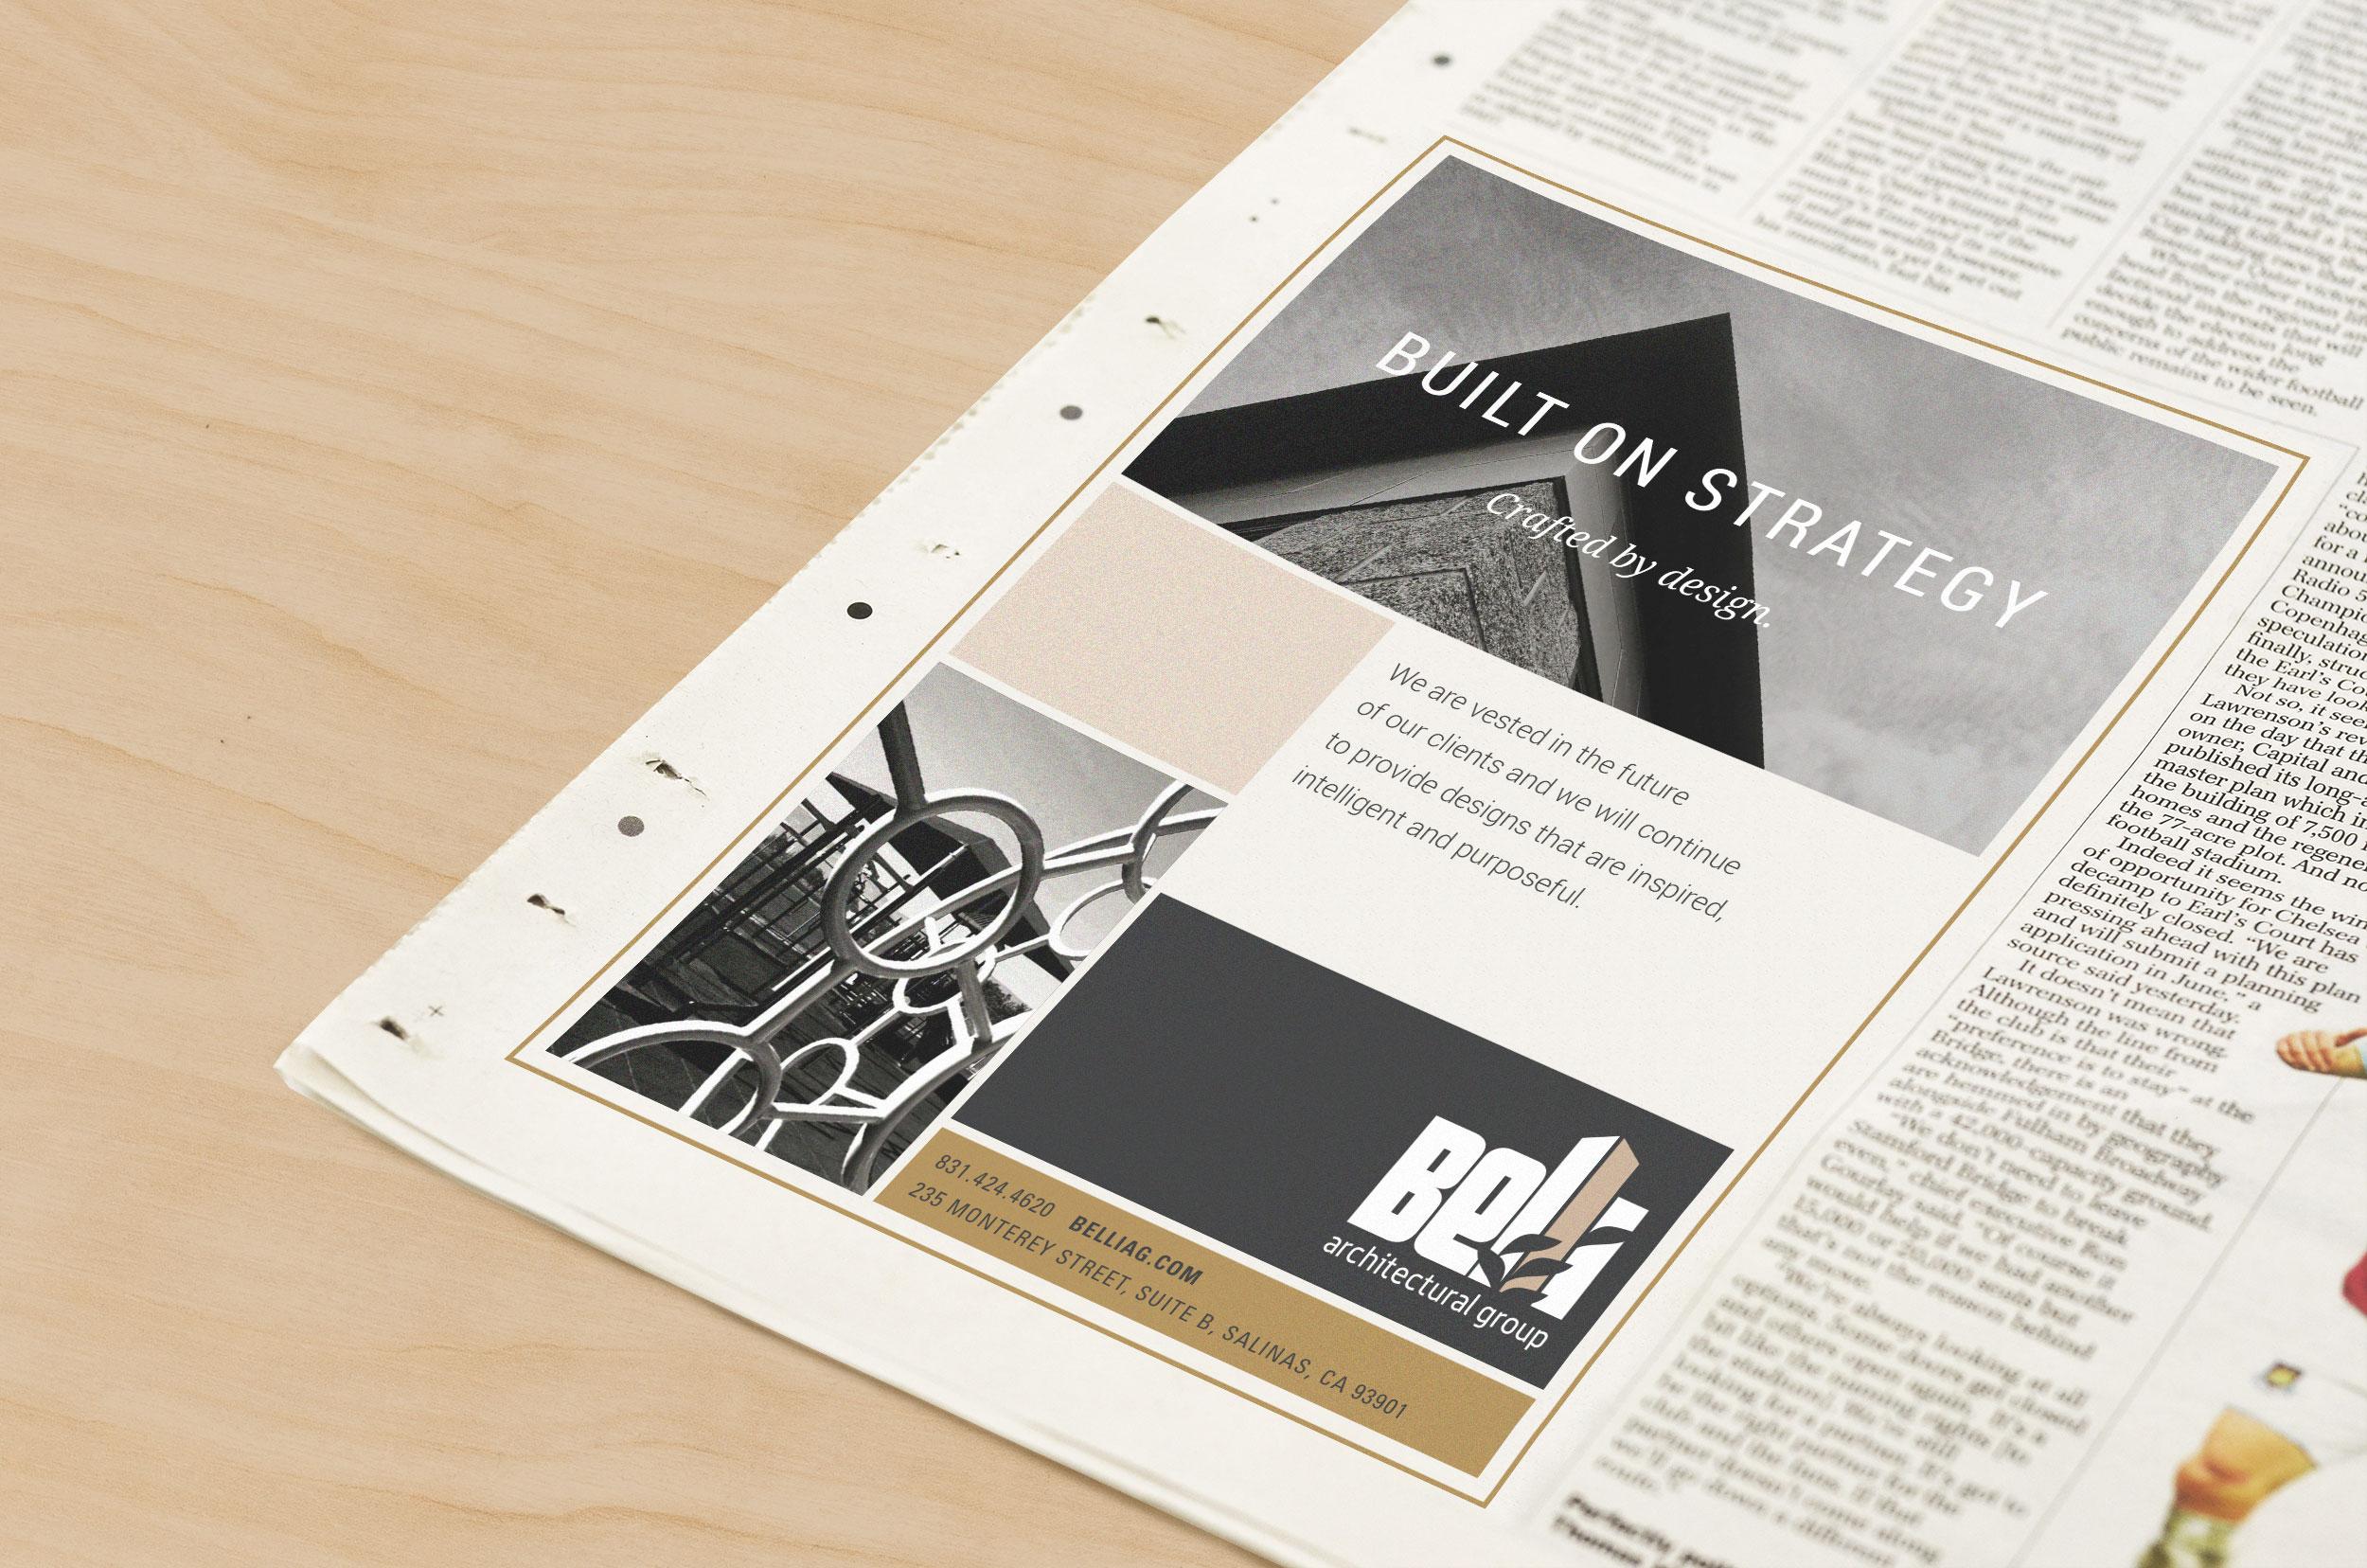 Belli Agricultural Group Newspaper Ad Design